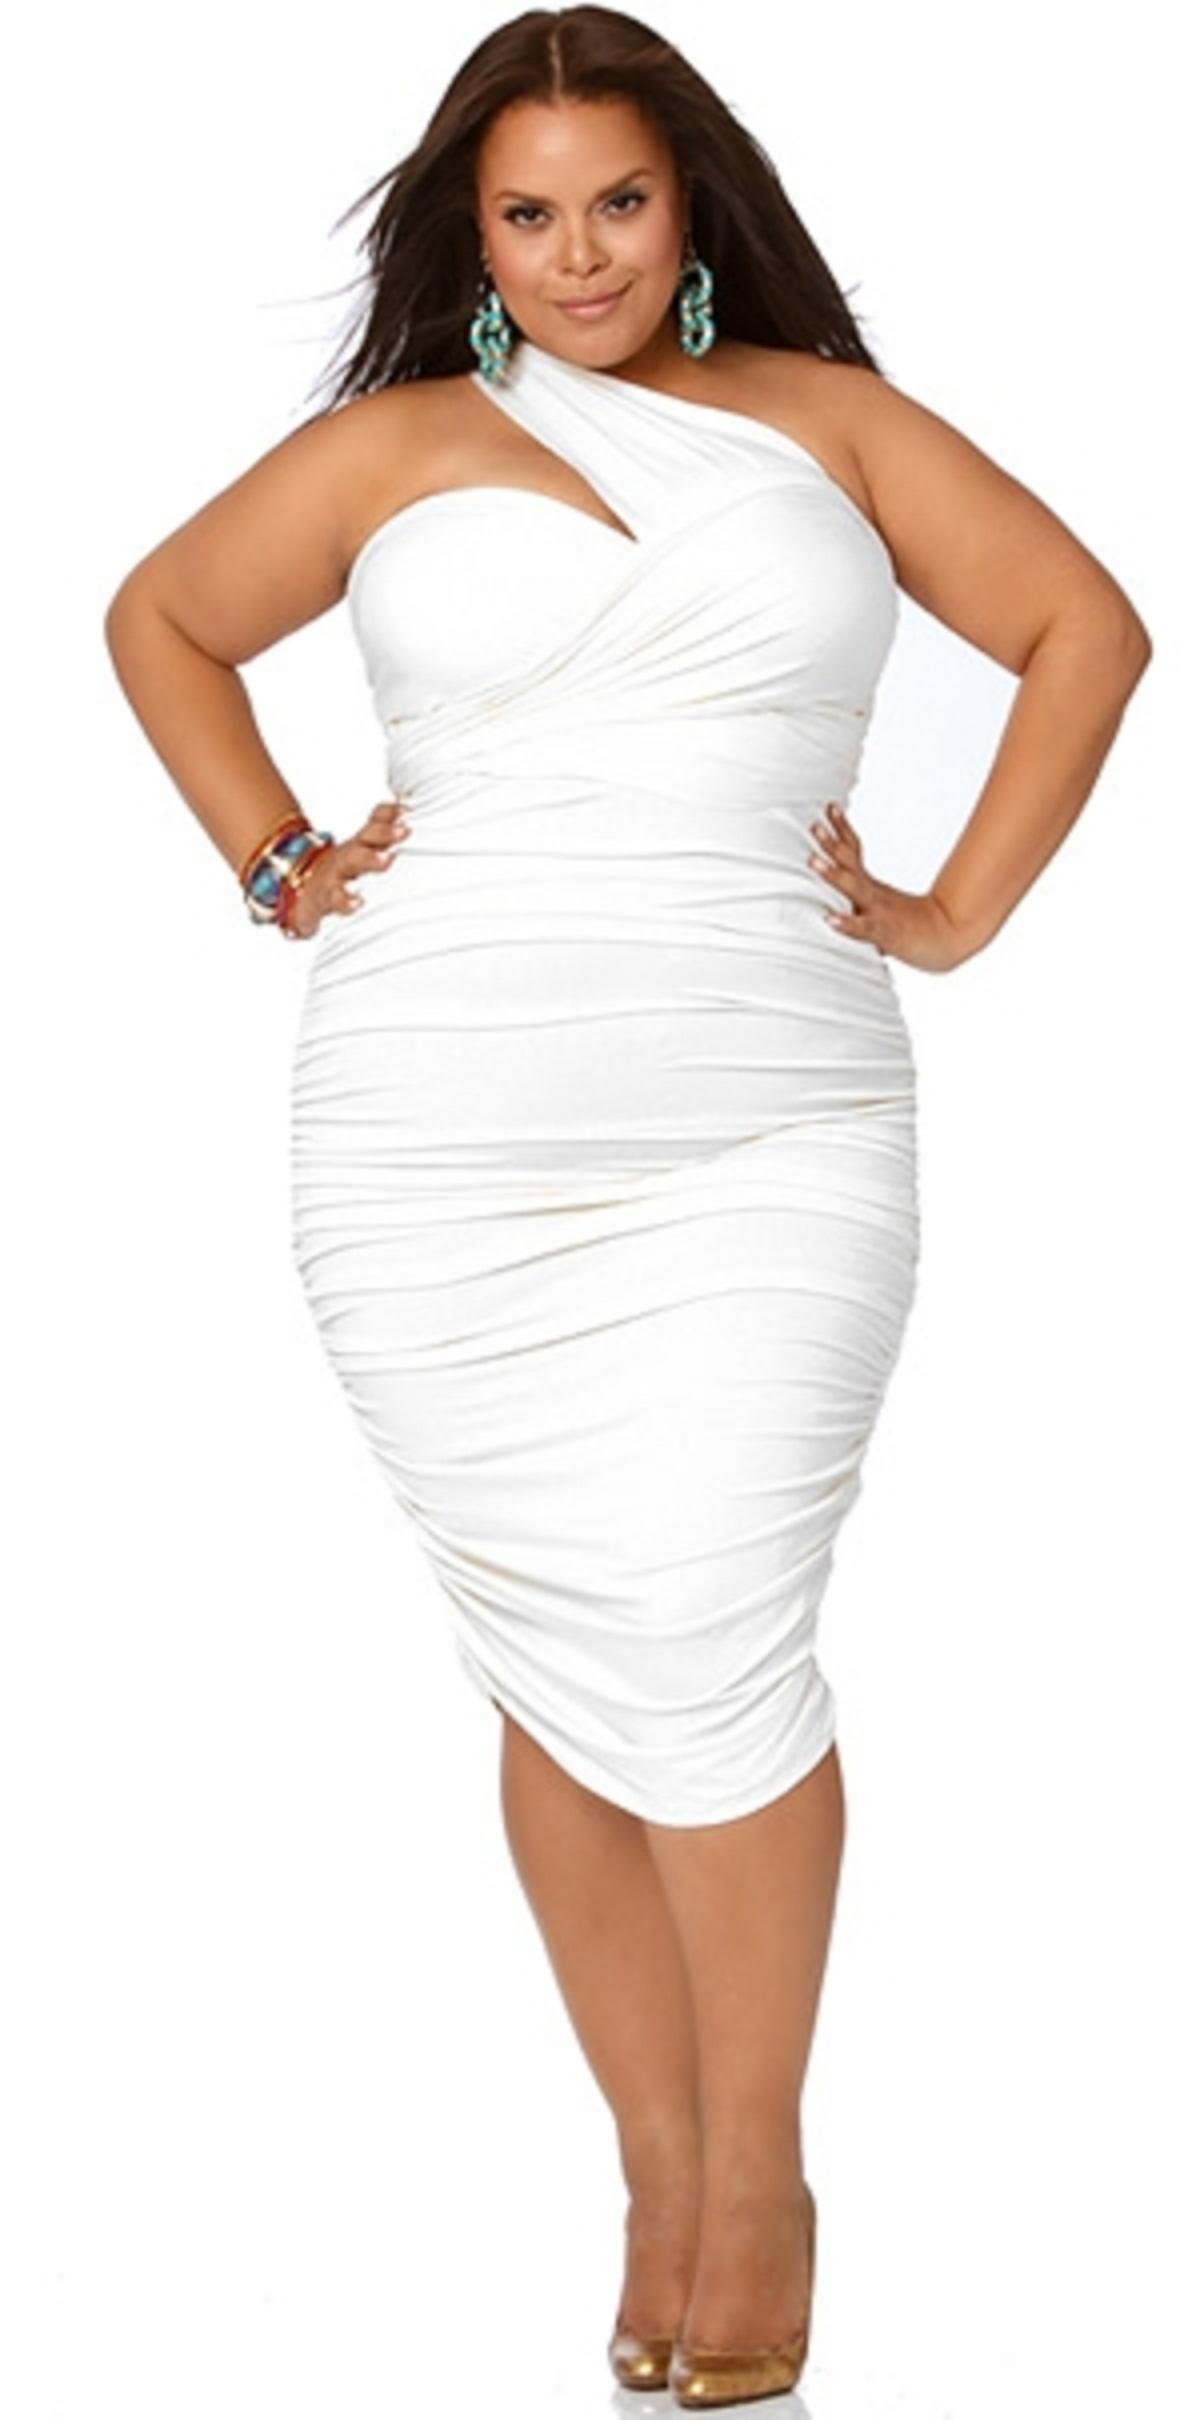 trendy white plus size dresses photo - 1 bygvgxo